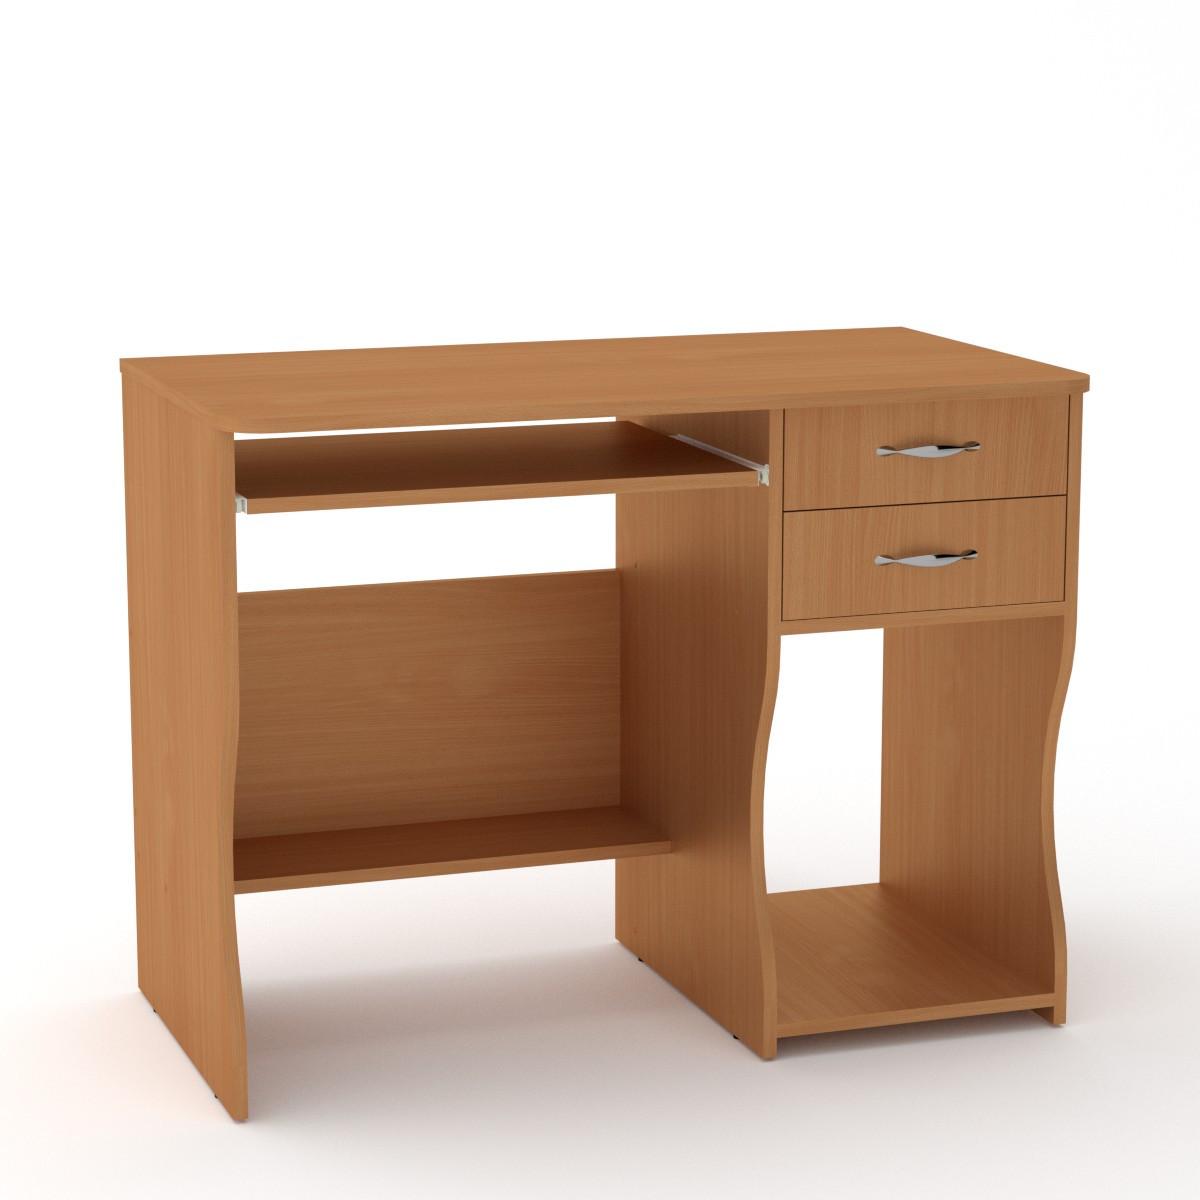 Стол компьютерный СКМ-7 бук Компанит (100х55х77 см)